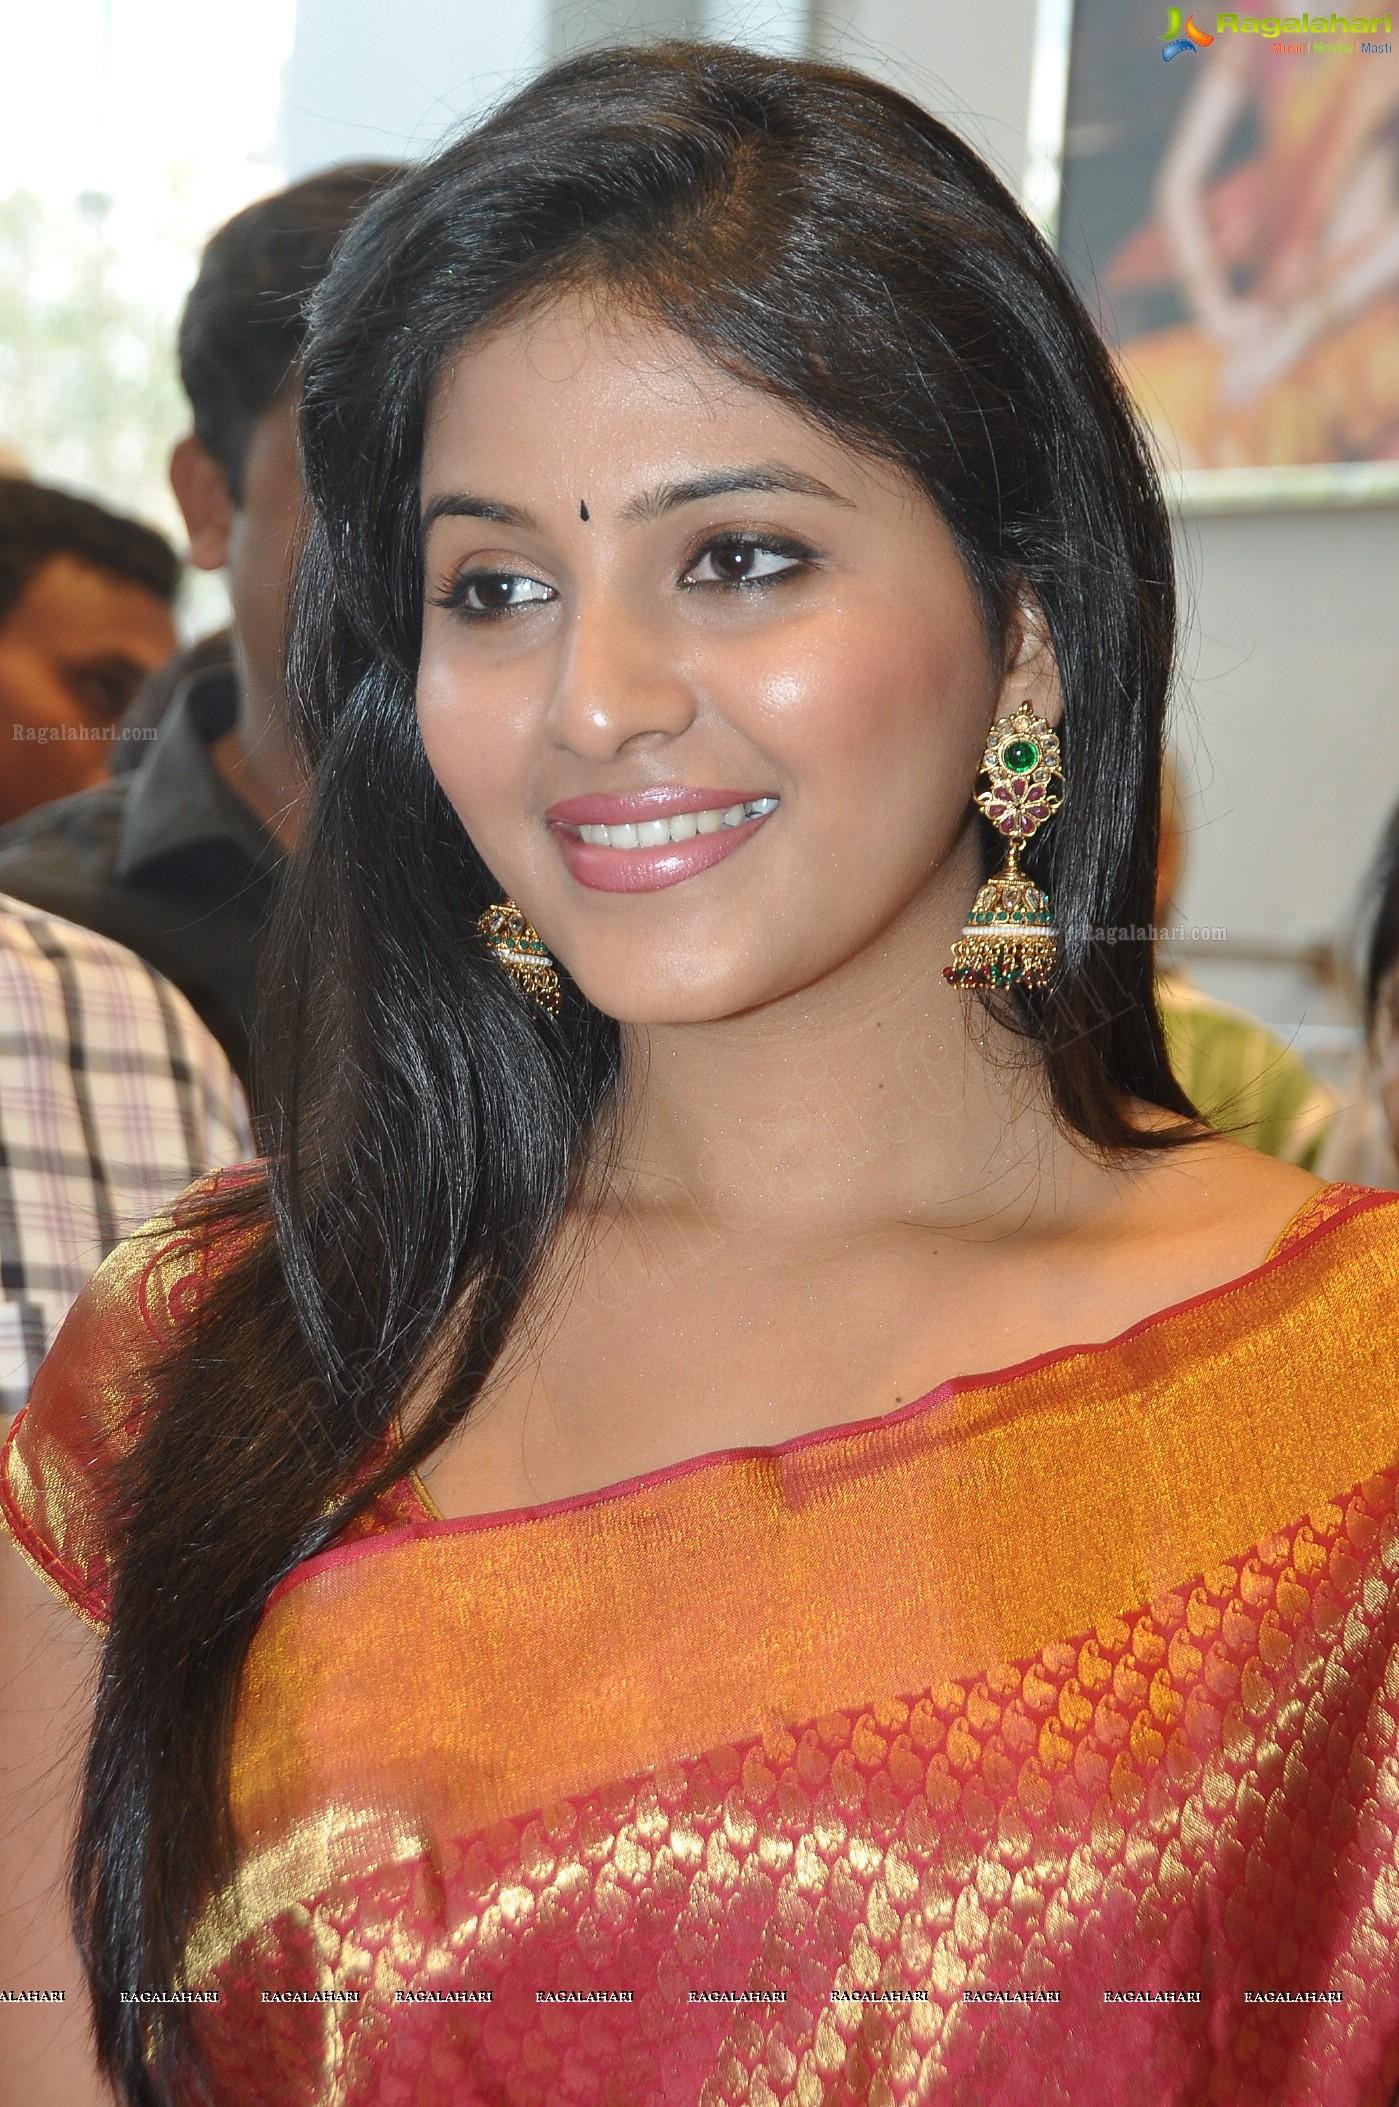 anjali (posters) image 12 | telugu movie actress photos,images